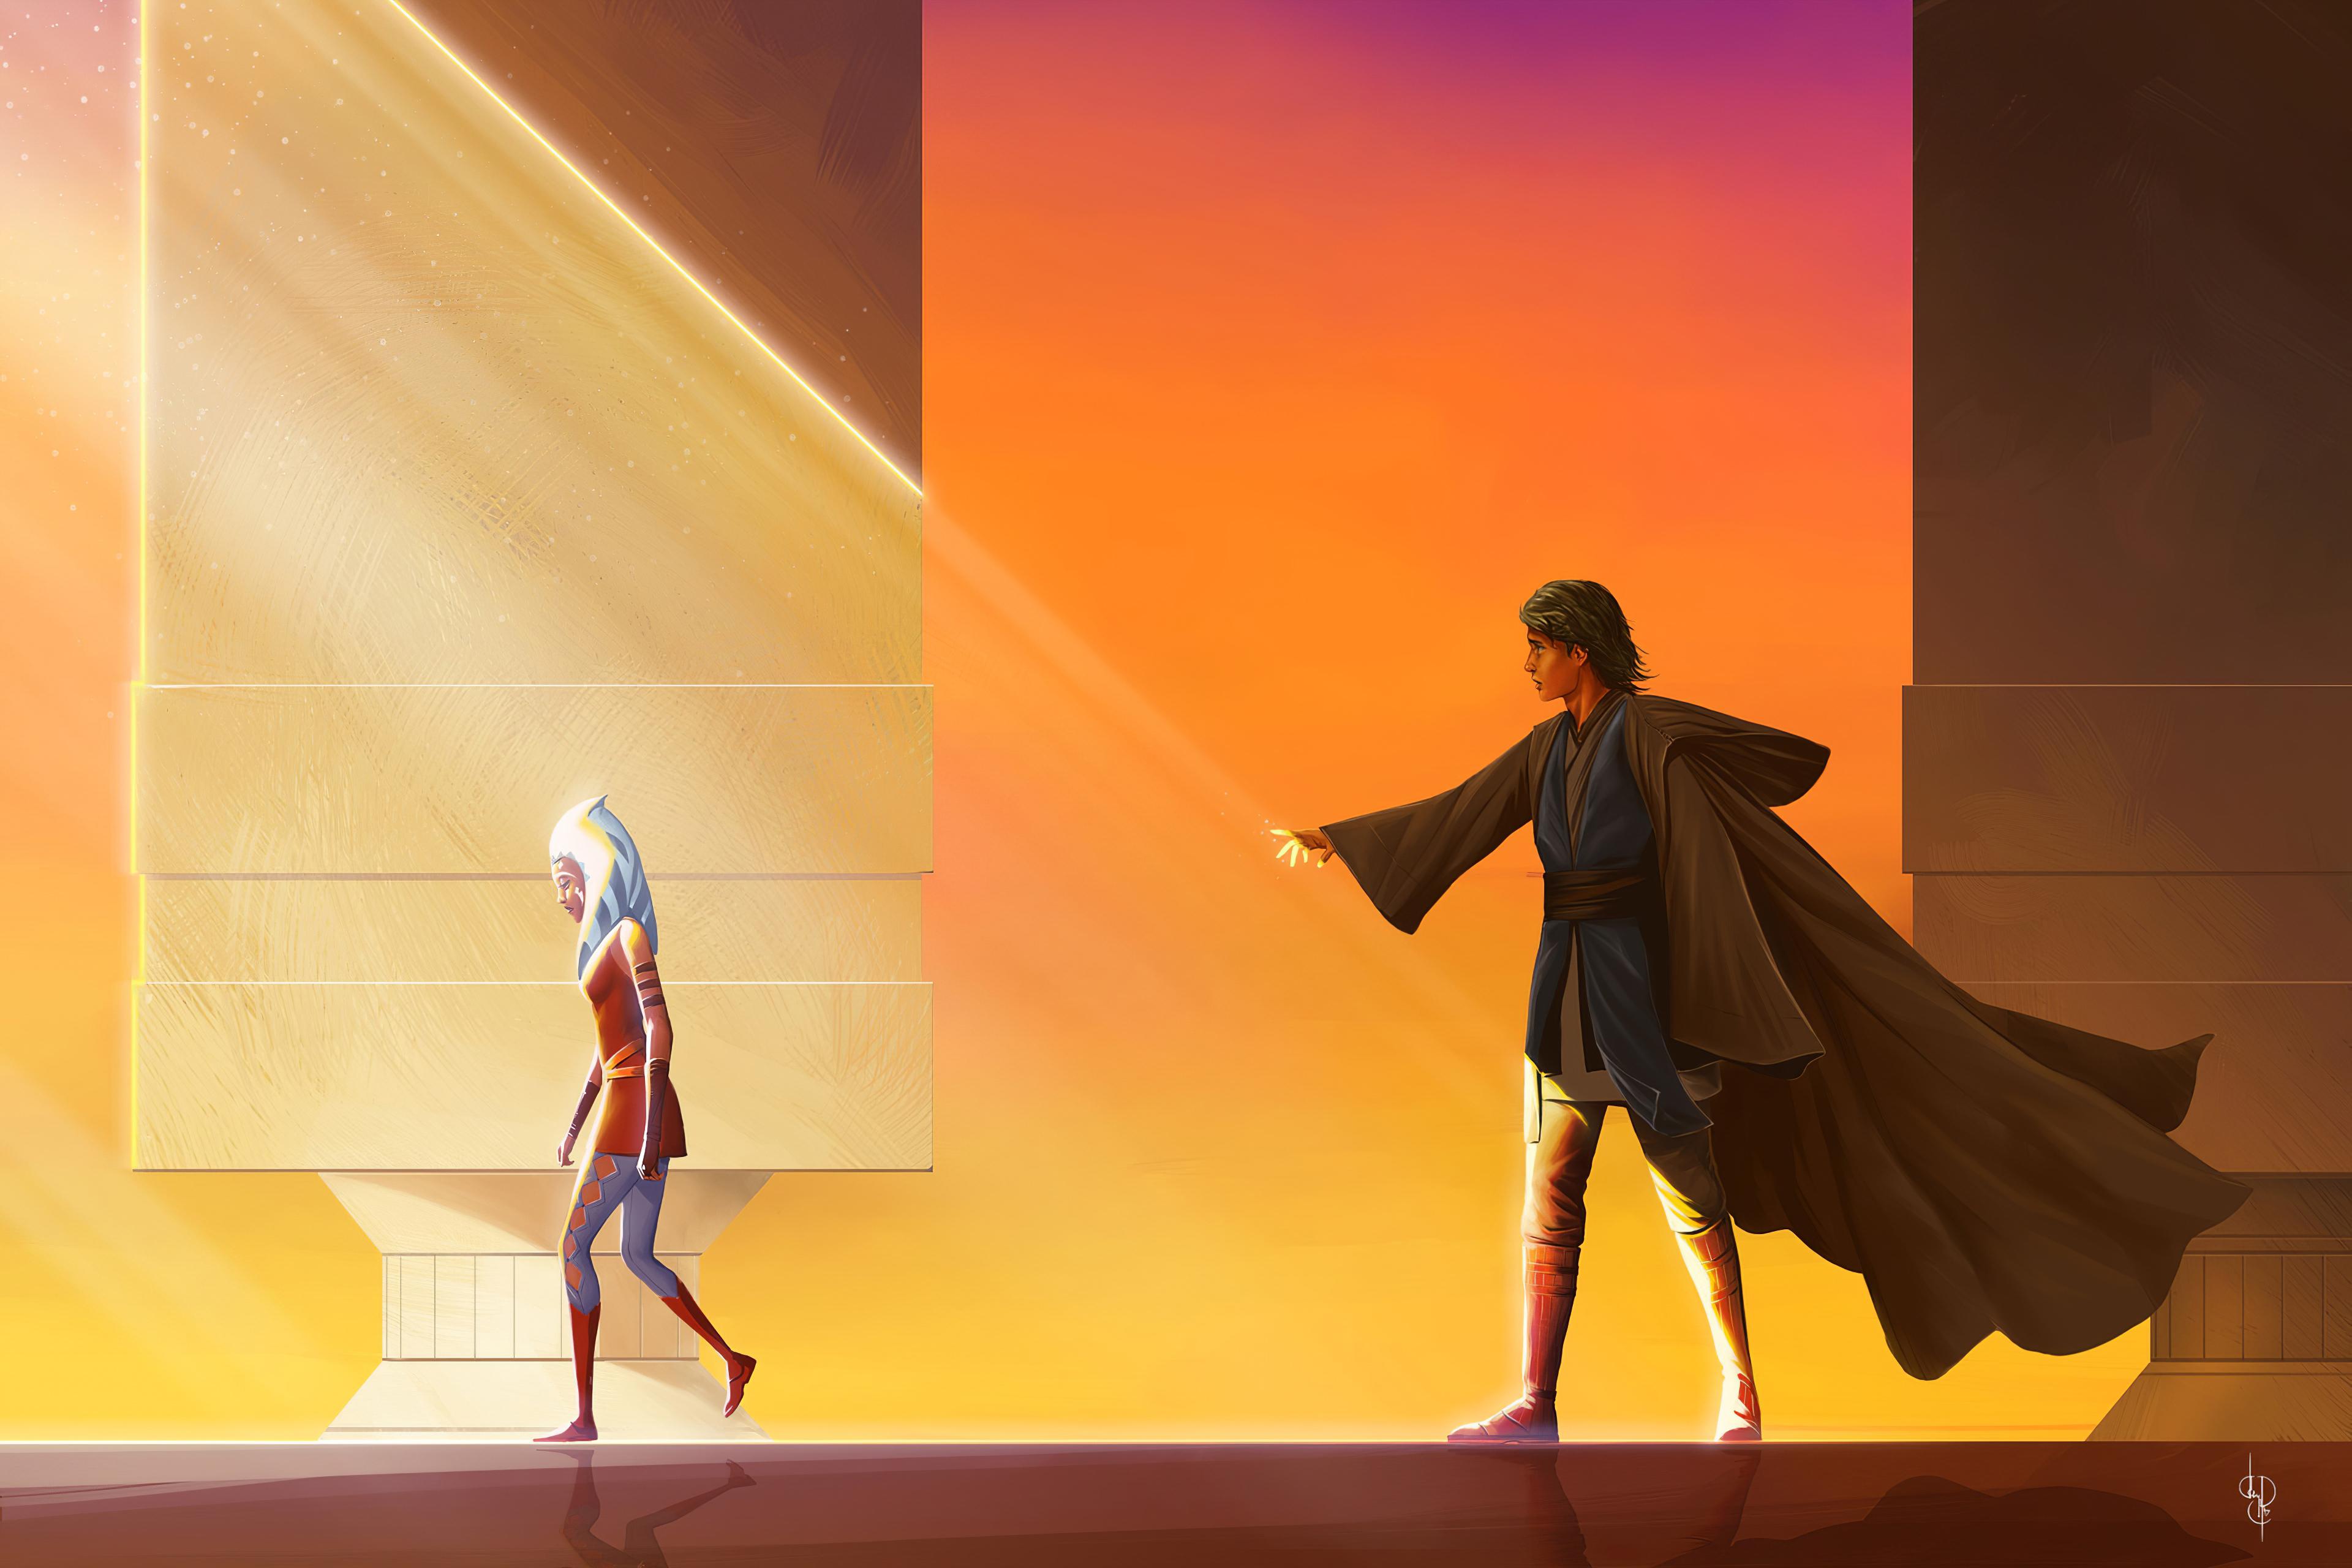 Captain Rex And Ahsoka Star Wars 4k Hd Artist 4k Wallpapers